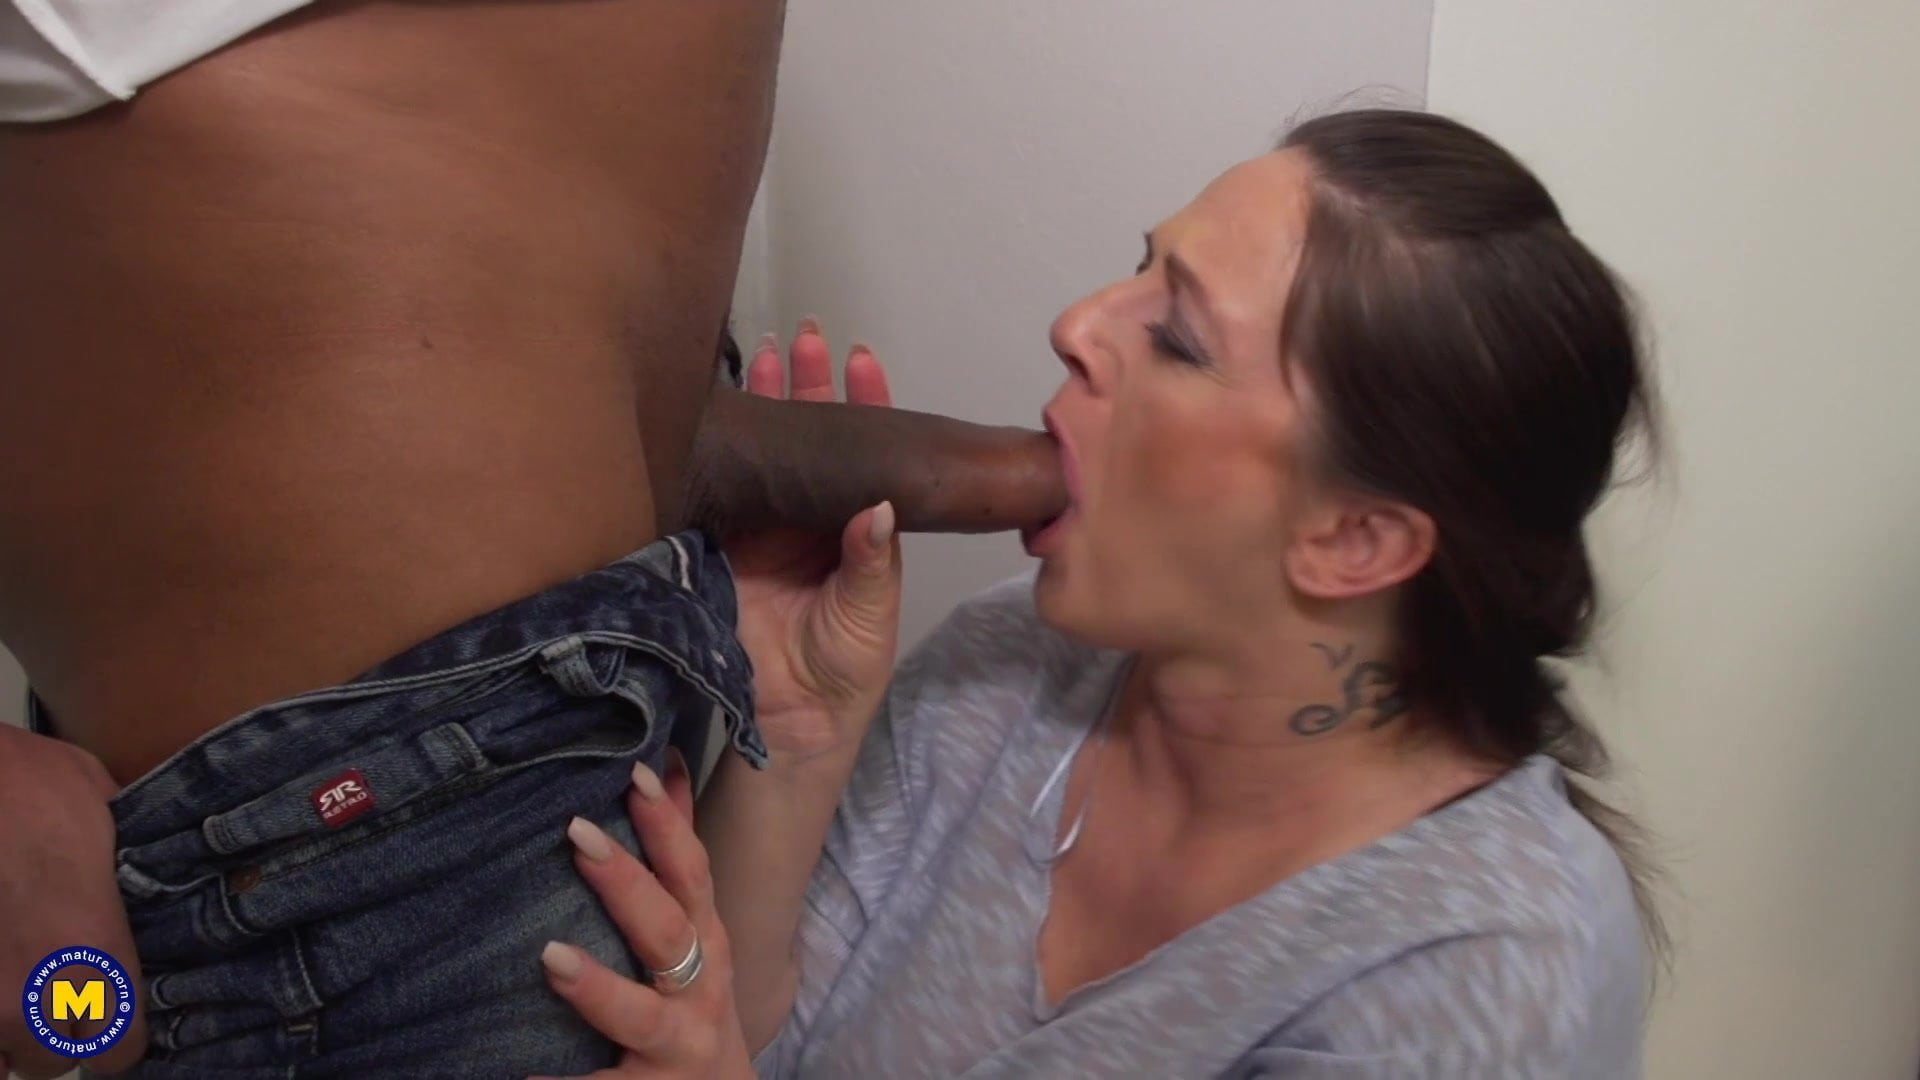 Sticking dildo down penis